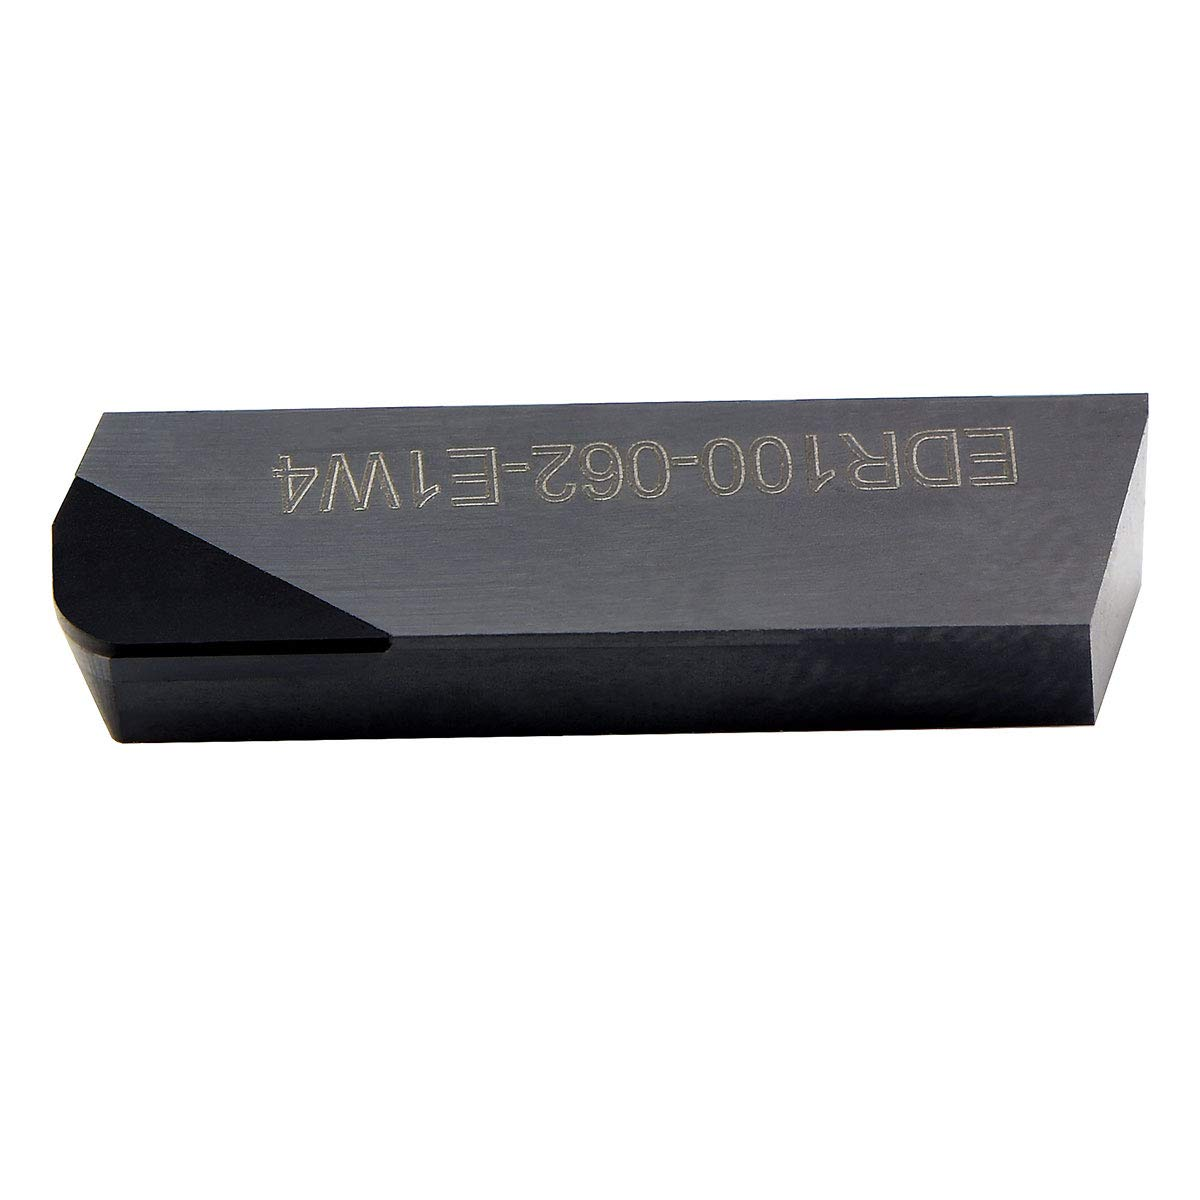 MAXTOOL 4PCs EDR100-062-E1-W4P4 ENDMILL PCD Tip Milling Inserts Polycrystalline Diamond Grade 1500